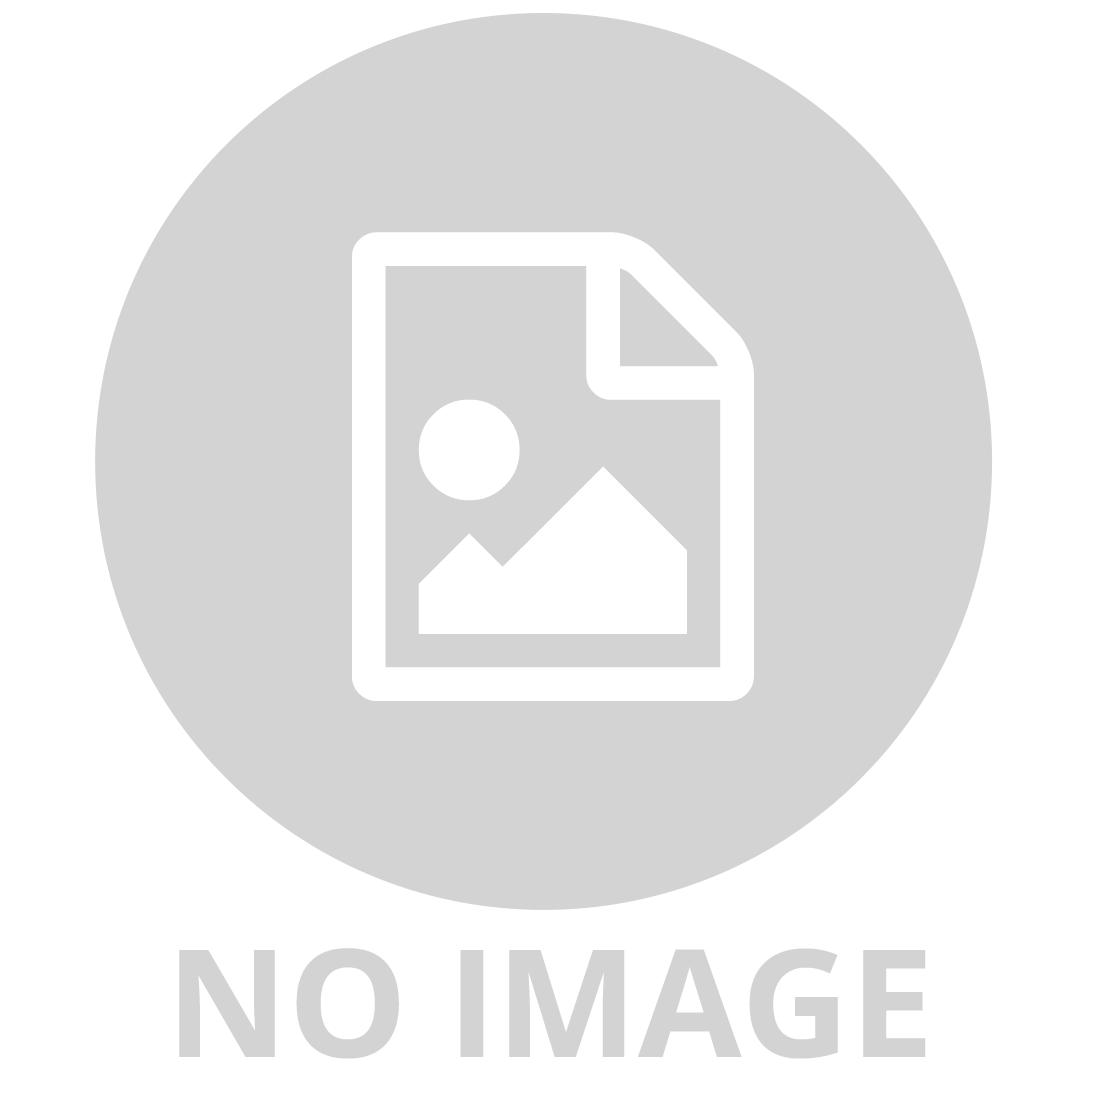 TAMIYA TS-10 FRENCH BLUE SPRAY PAINT FOR PLASTICS